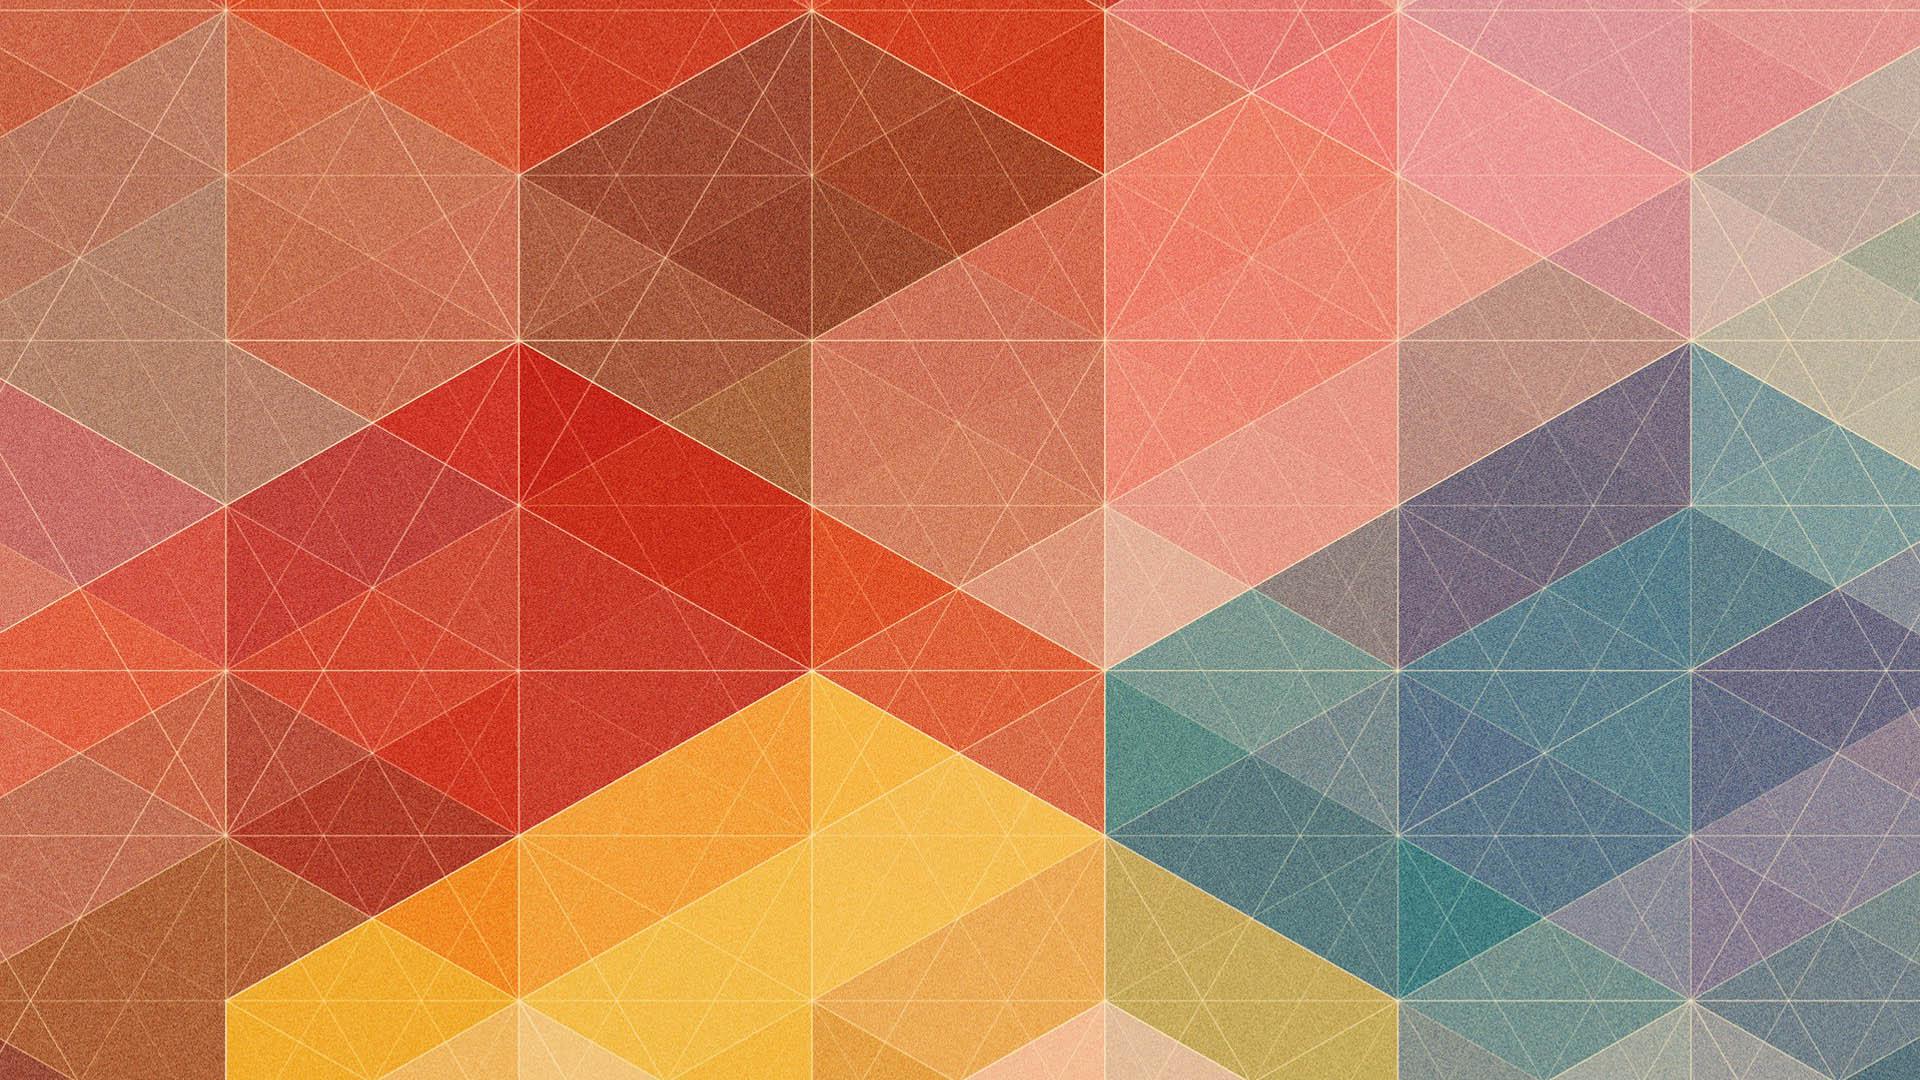 Geometric Desktop Backgrounds Group 71 1920x1080